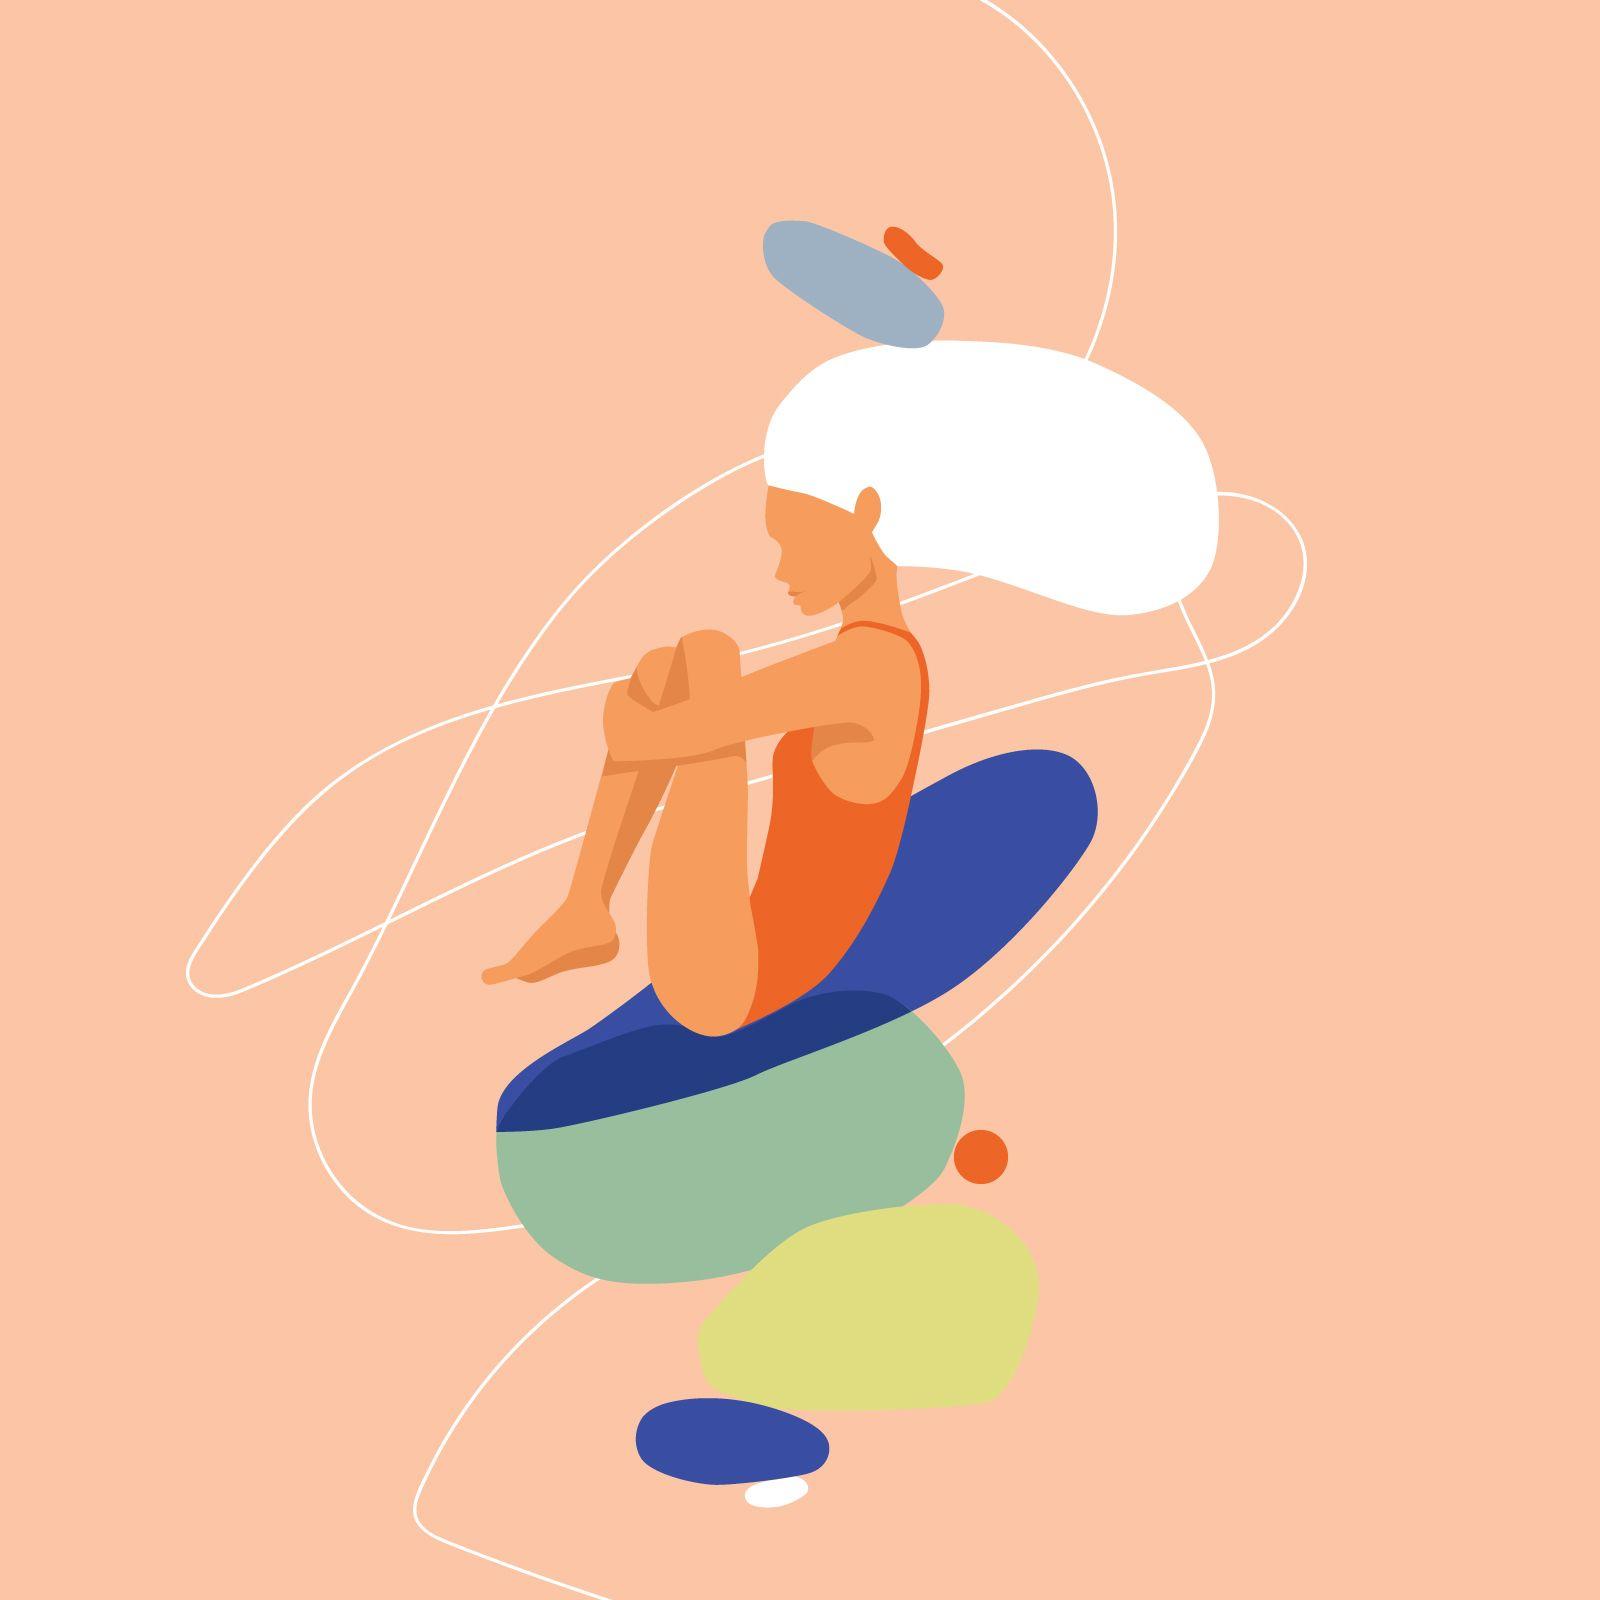 garance-illustration-Irina-Kruglova-Meditative